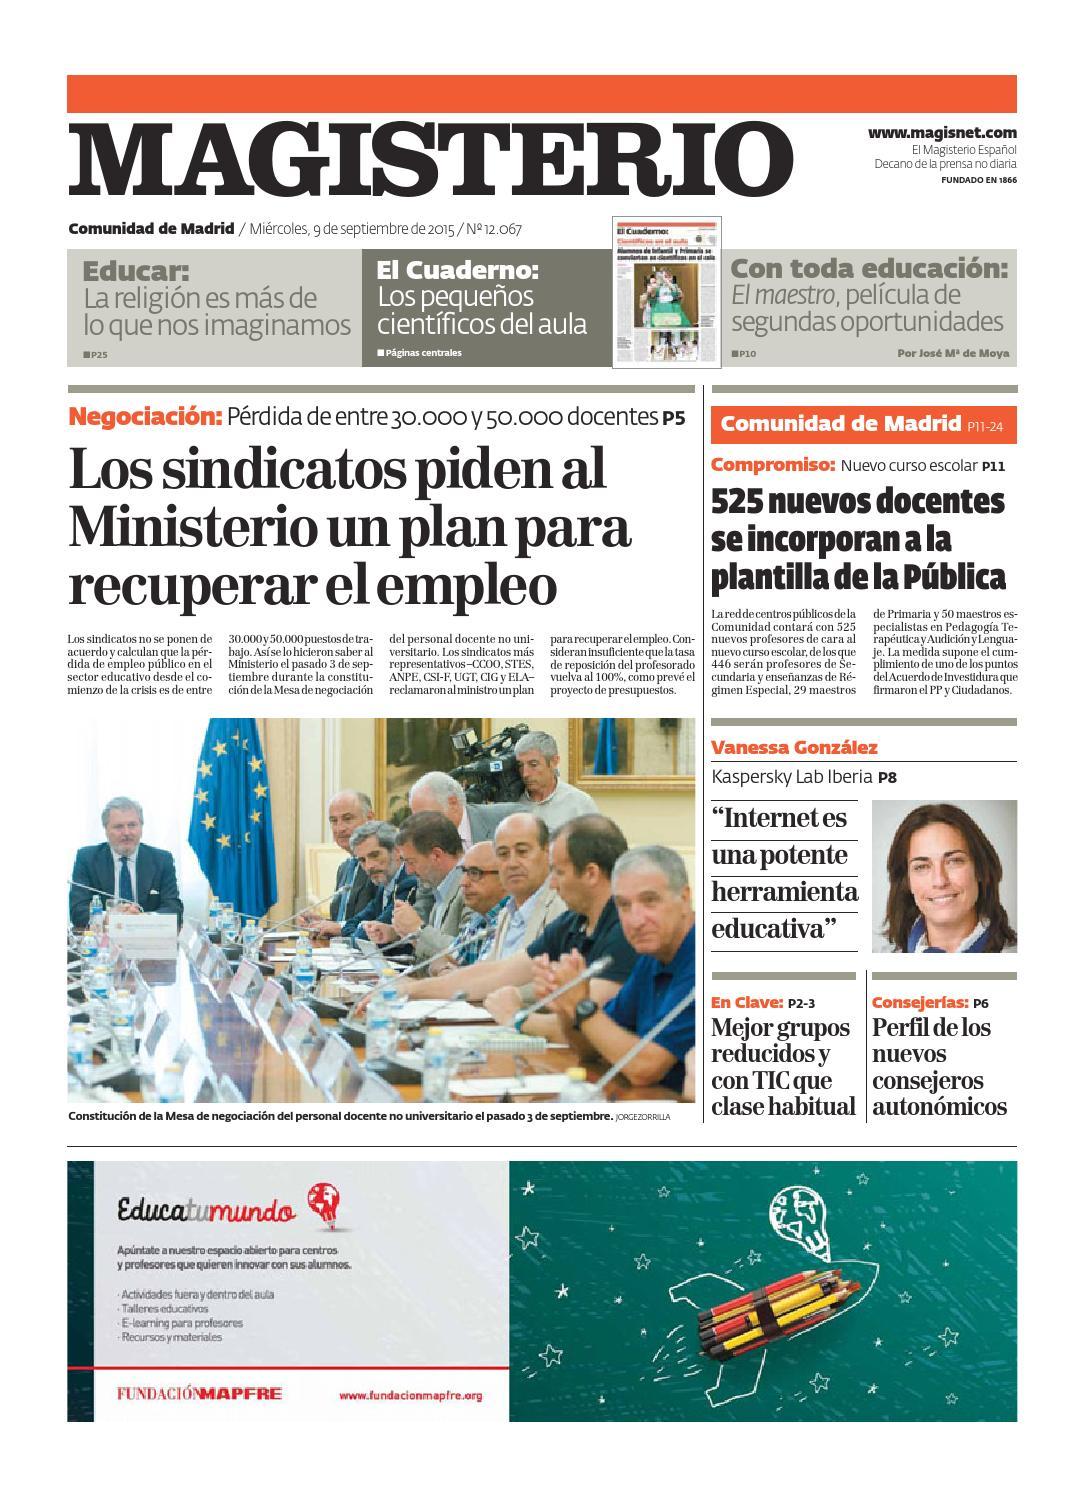 Magisterio Nº 12067 Edición Madrid by Grupo Siena - issuu